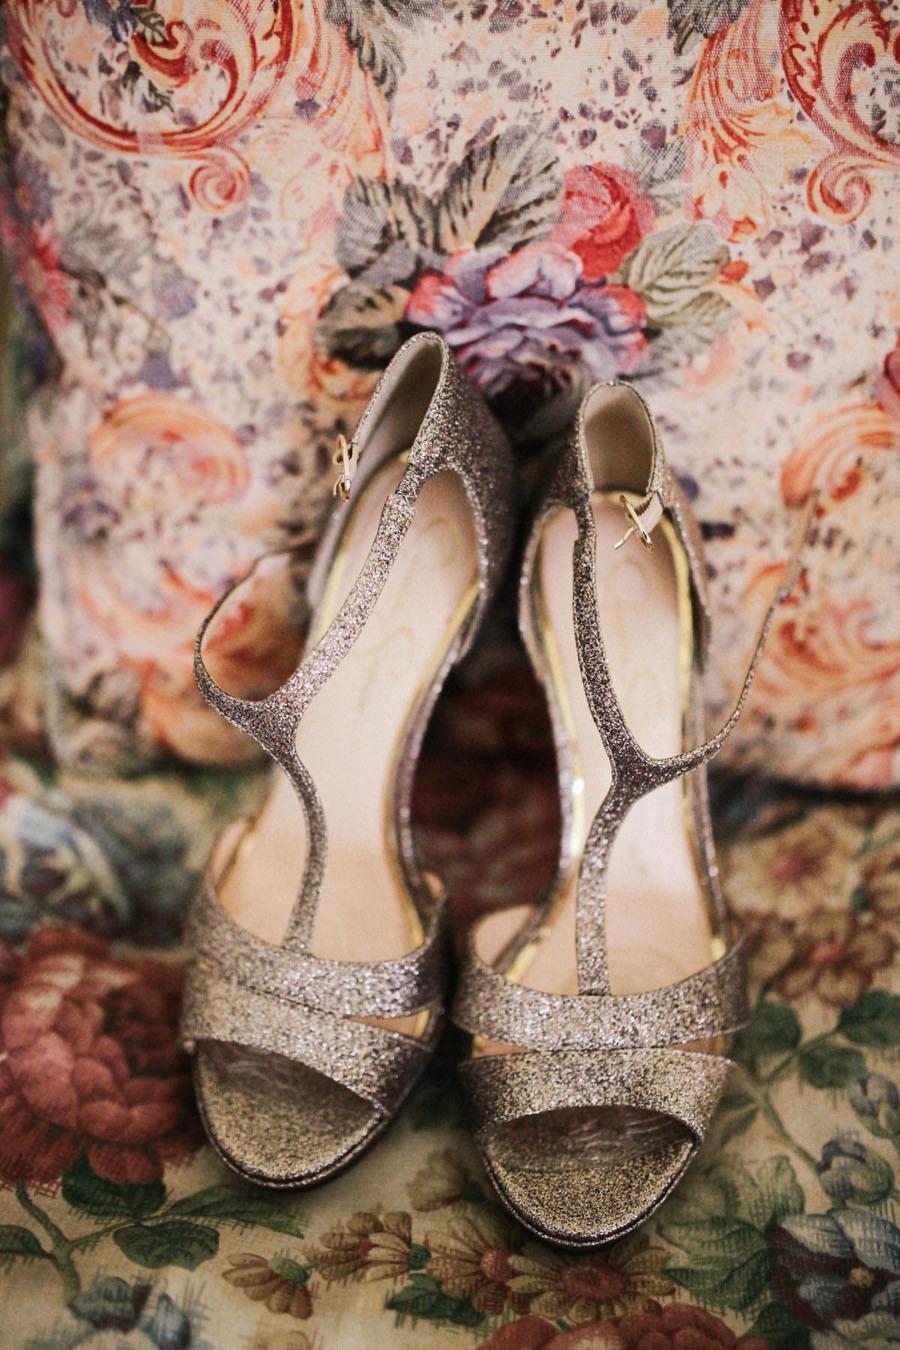 Uncategorized outdoor vintage glam wedding rustic wedding chic - Amazing Wedding Dress Designer Anna Campbell S Rustic Glam Wedding